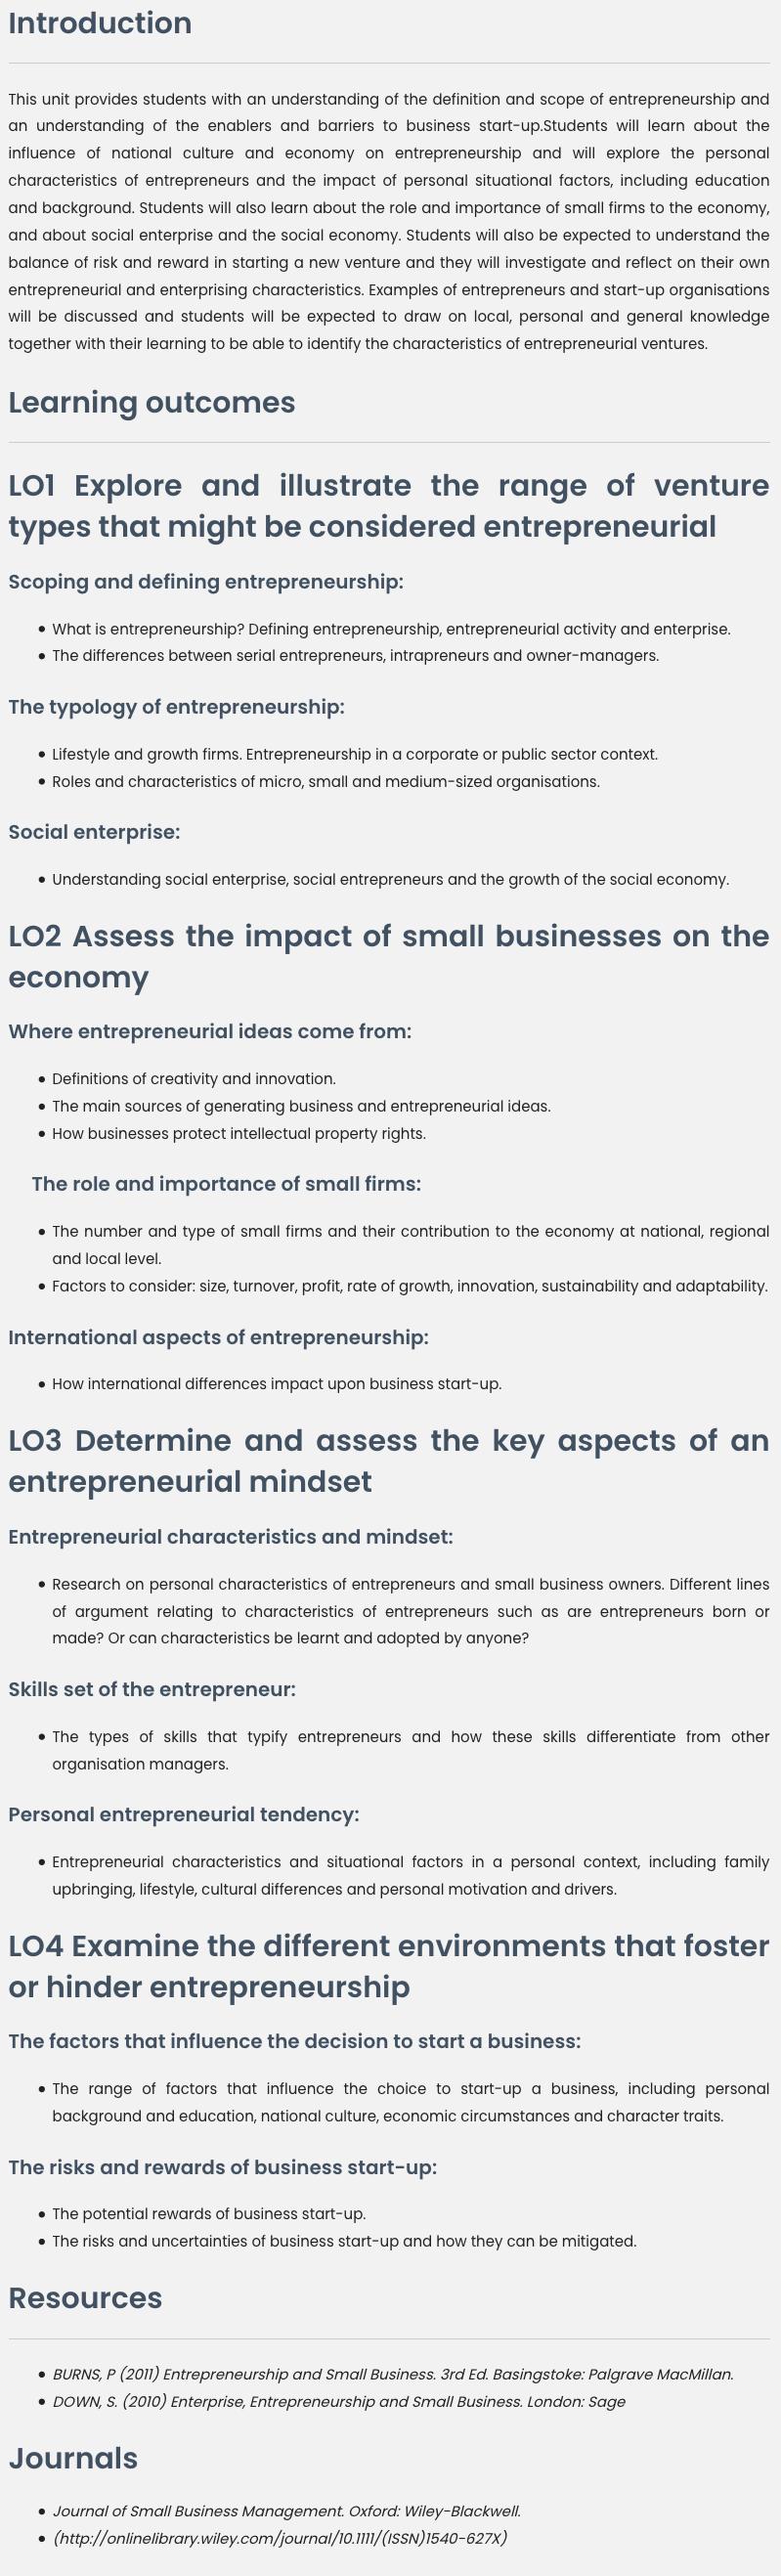 Unit 9 Entrepreneurship And Small Business Management